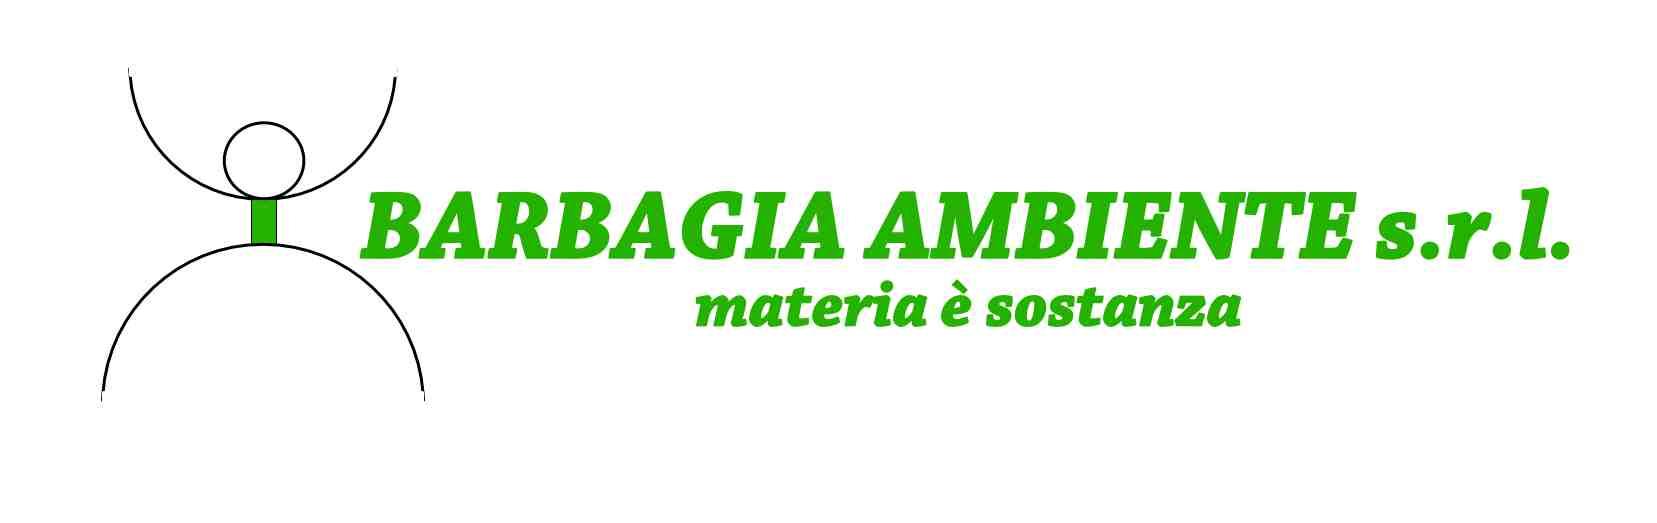 BARBAGIA AMBIENTE - LOGO